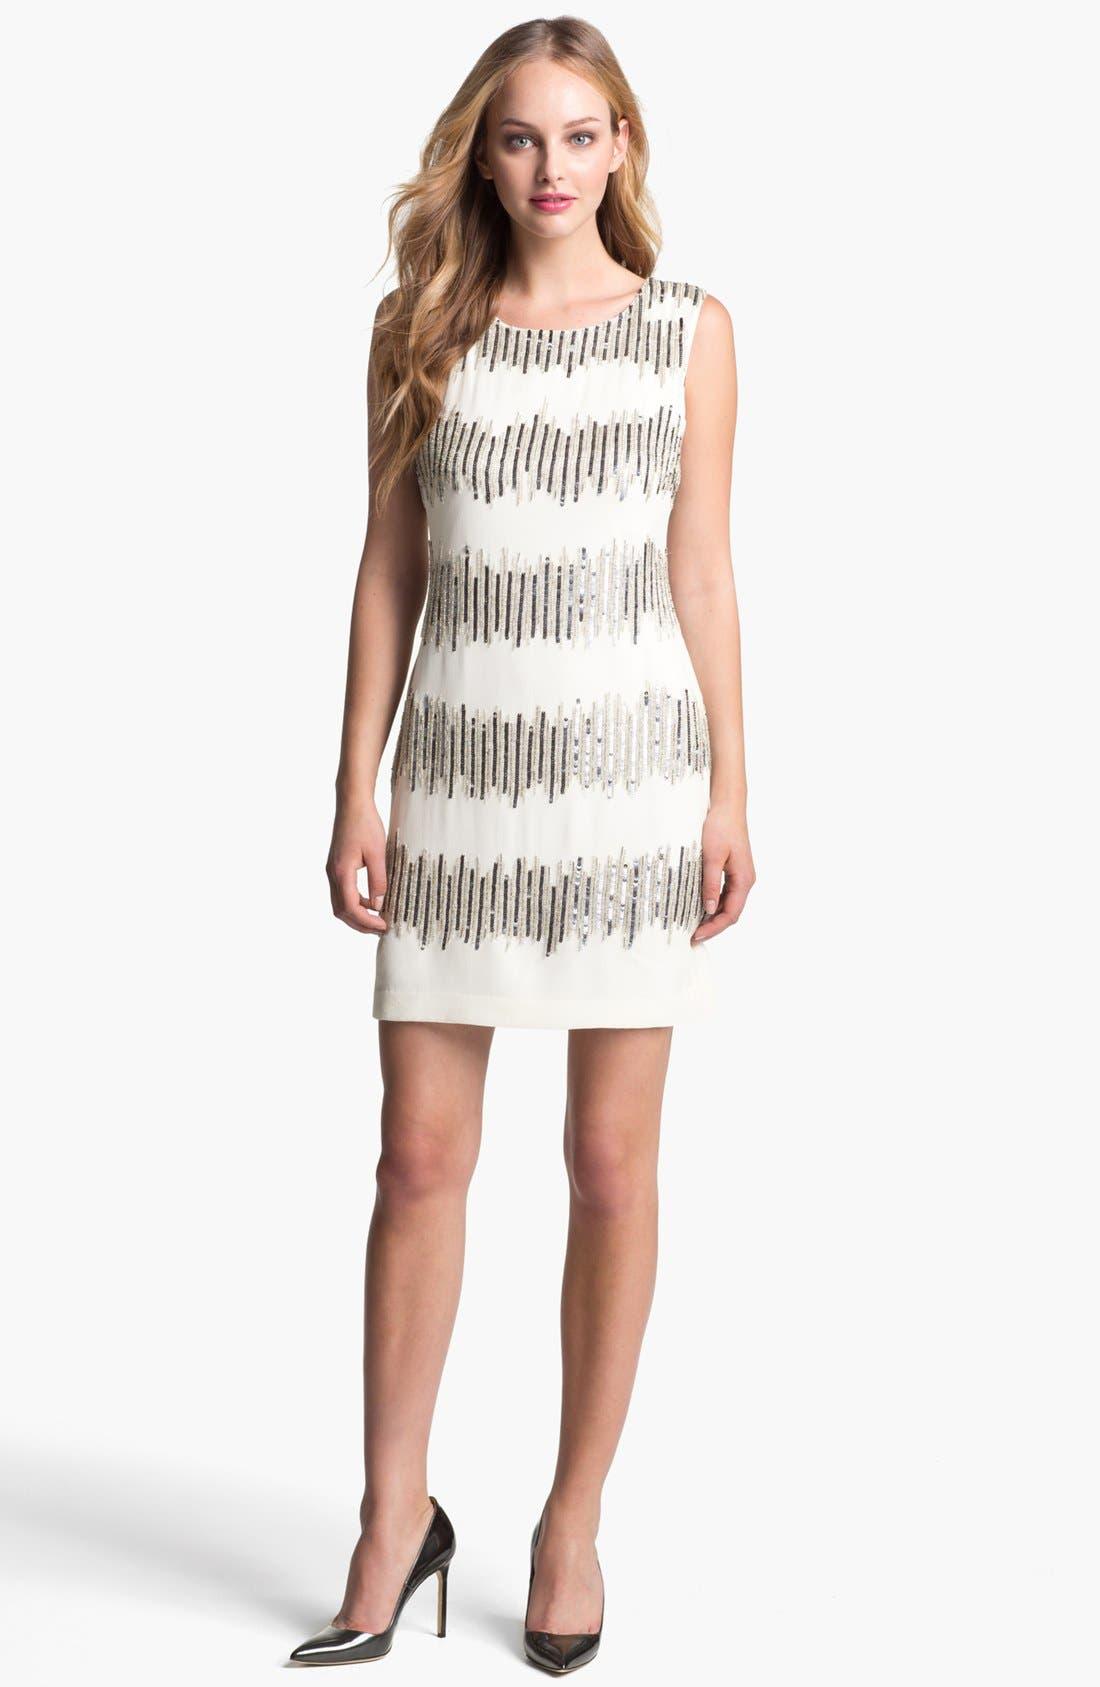 Alternate Image 1 Selected - Adrianna Papell Embellished Sleeveless Shift Dress